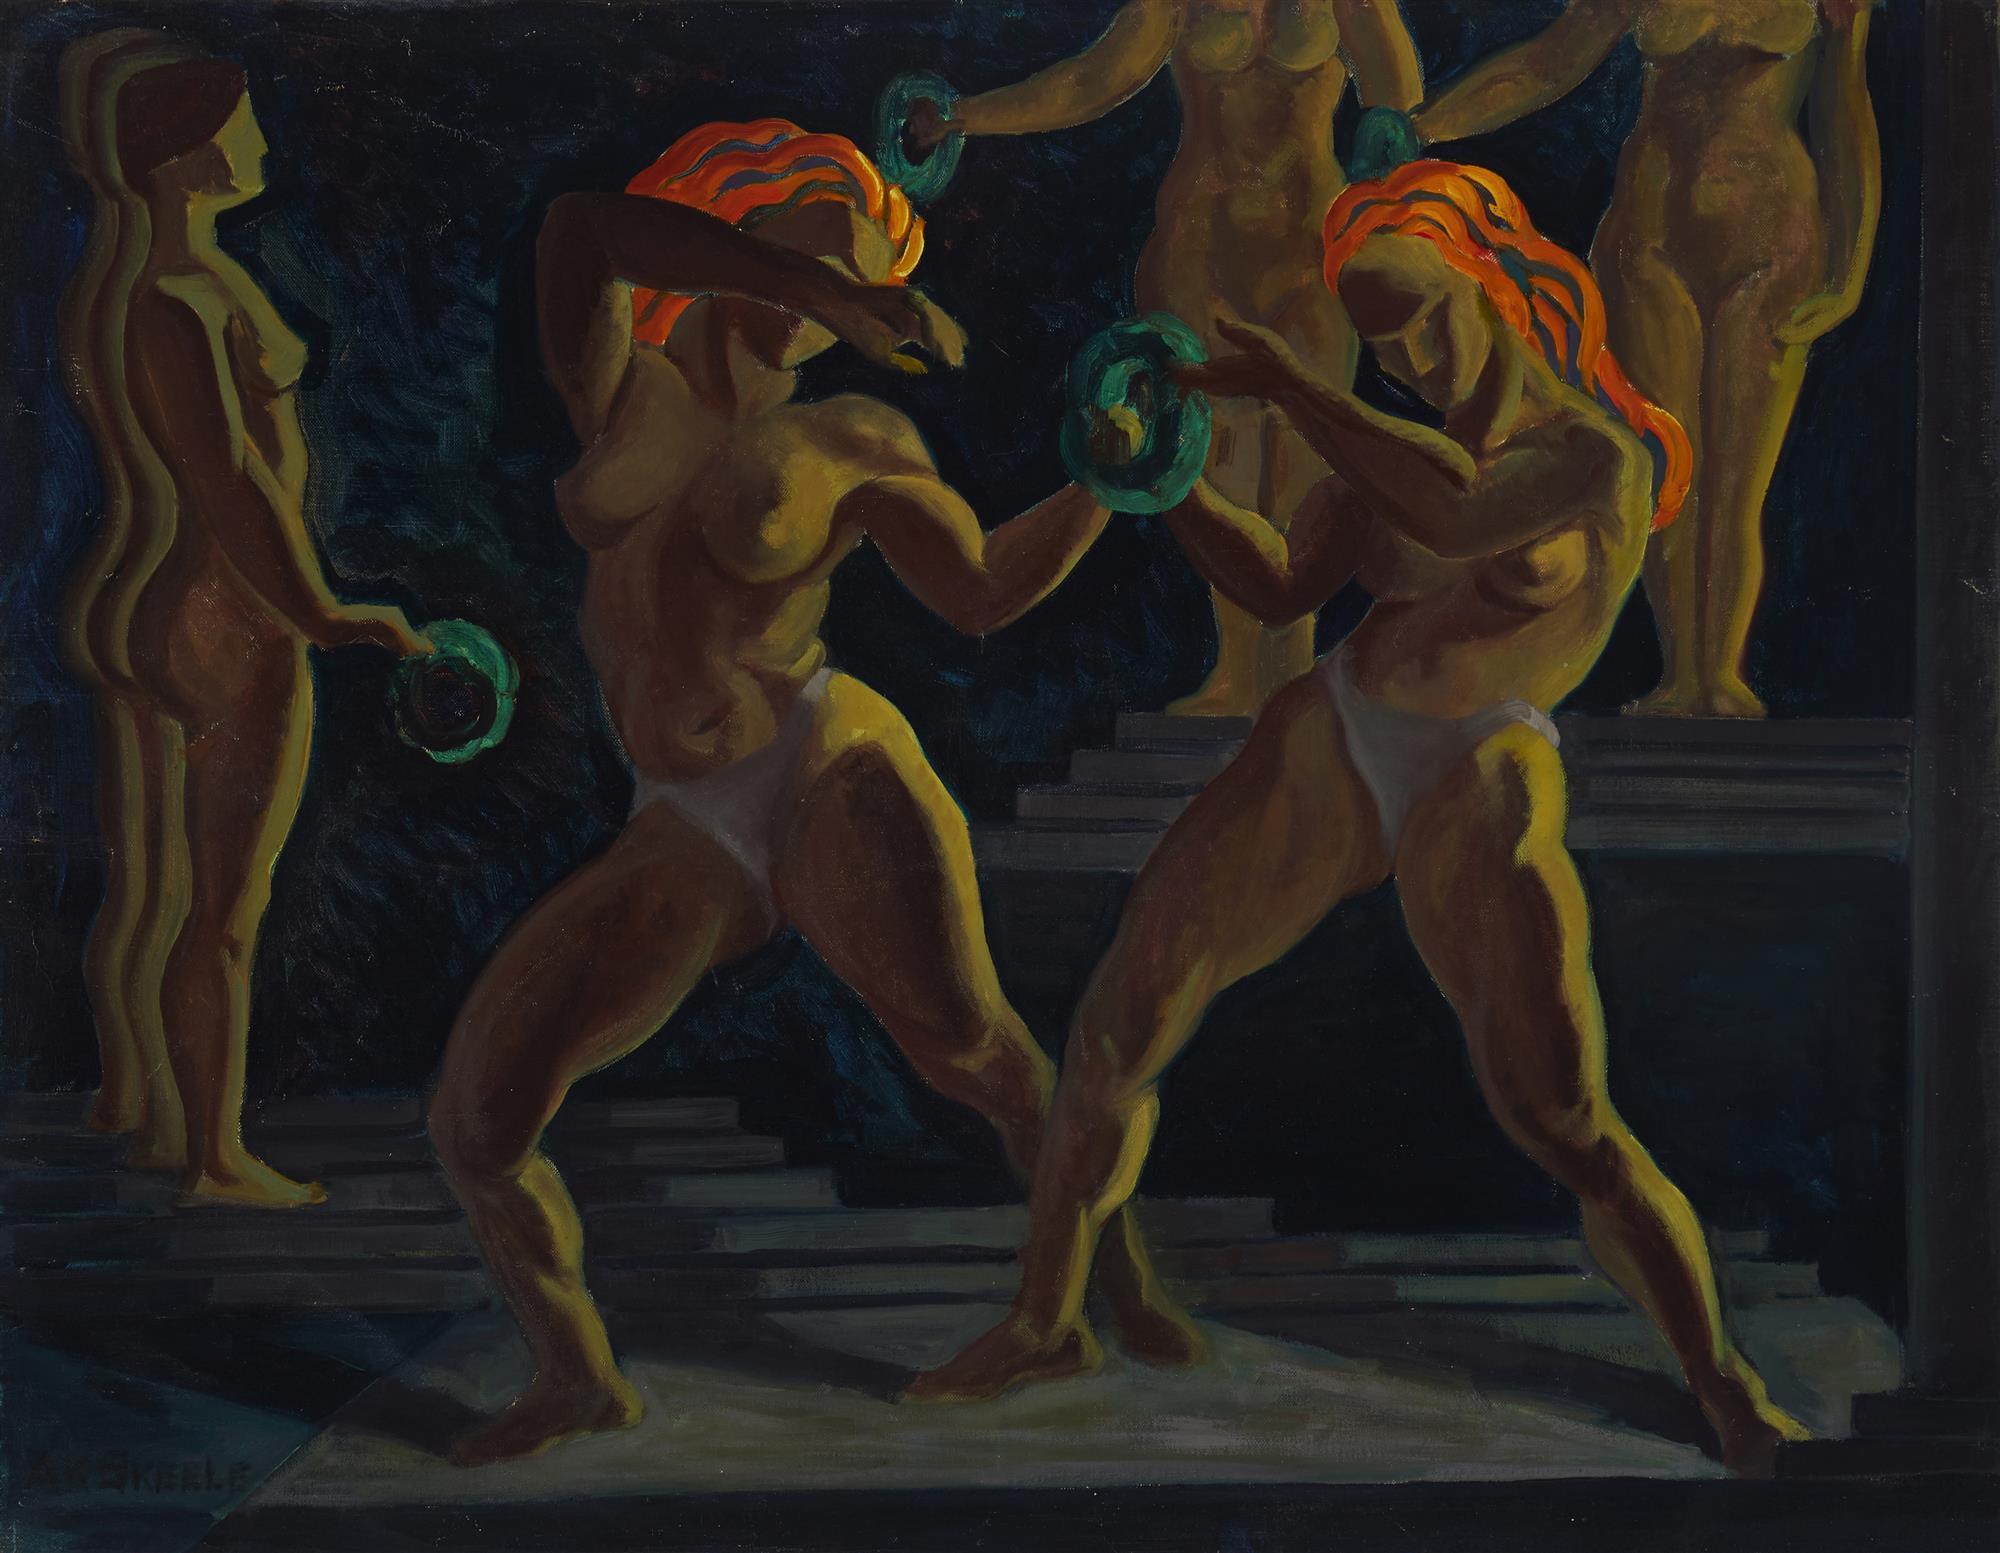 "Anna Katherine Skeele, (1896-1963, Pasadena, CA), Stylized female dancers, Oil on canvas, 26"" H x 34"" W"